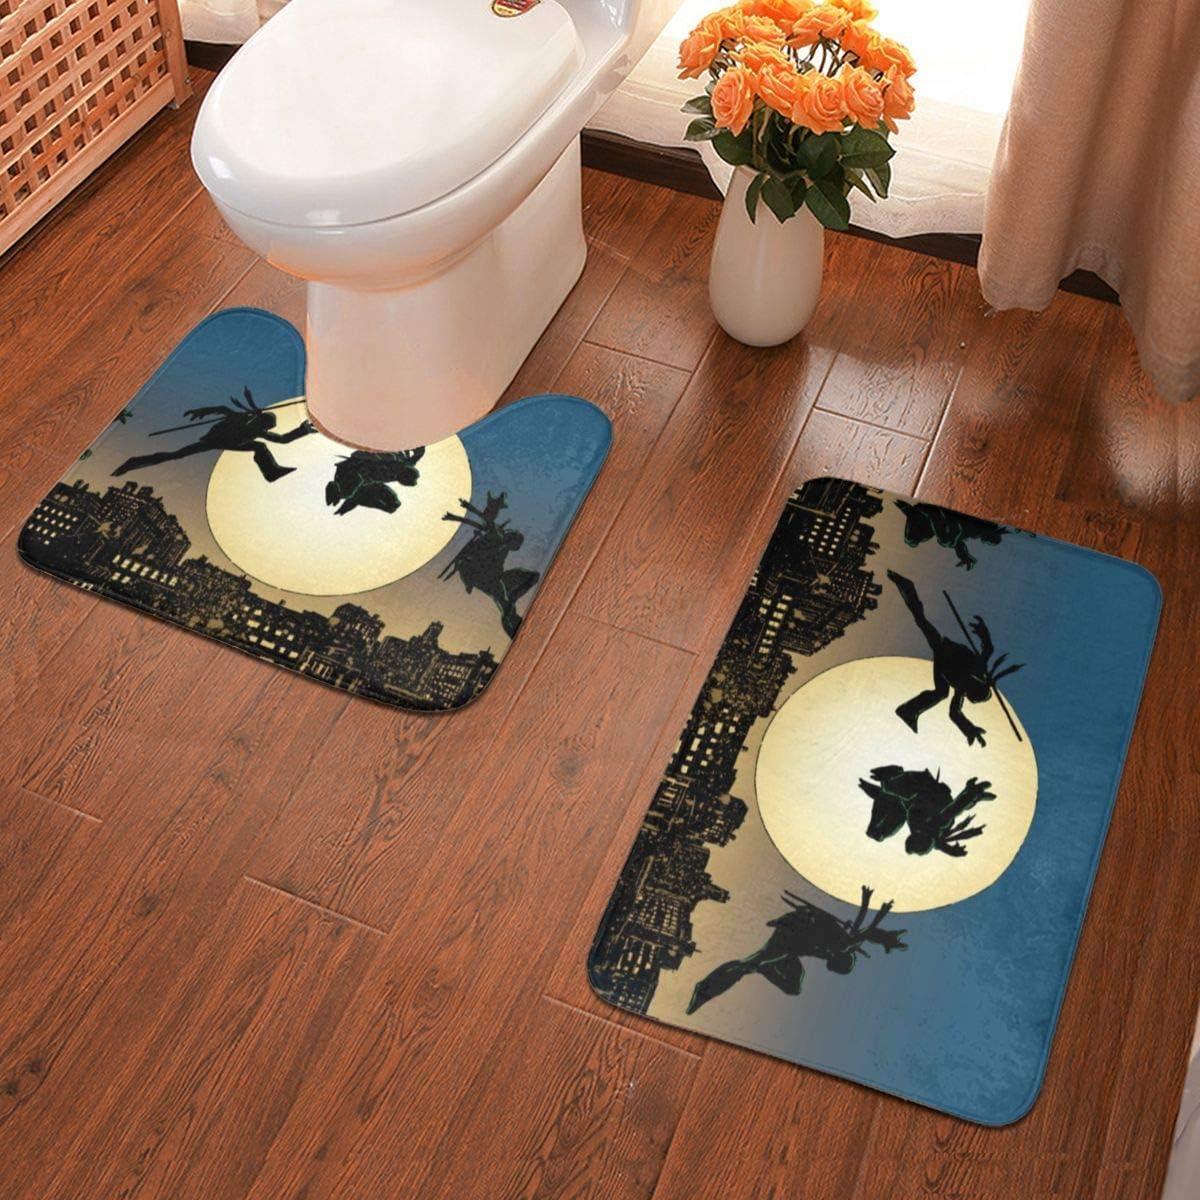 Boweike Teenage Mutant Ninja Turtles Bathroom Antiskid Pad Non-Slip Bath Carpet Floor Mat Rug 2 Sets -Floor Mat+U-Shaped Pad, Toilet Washable Blanket Mats for Bathroom Home Shower